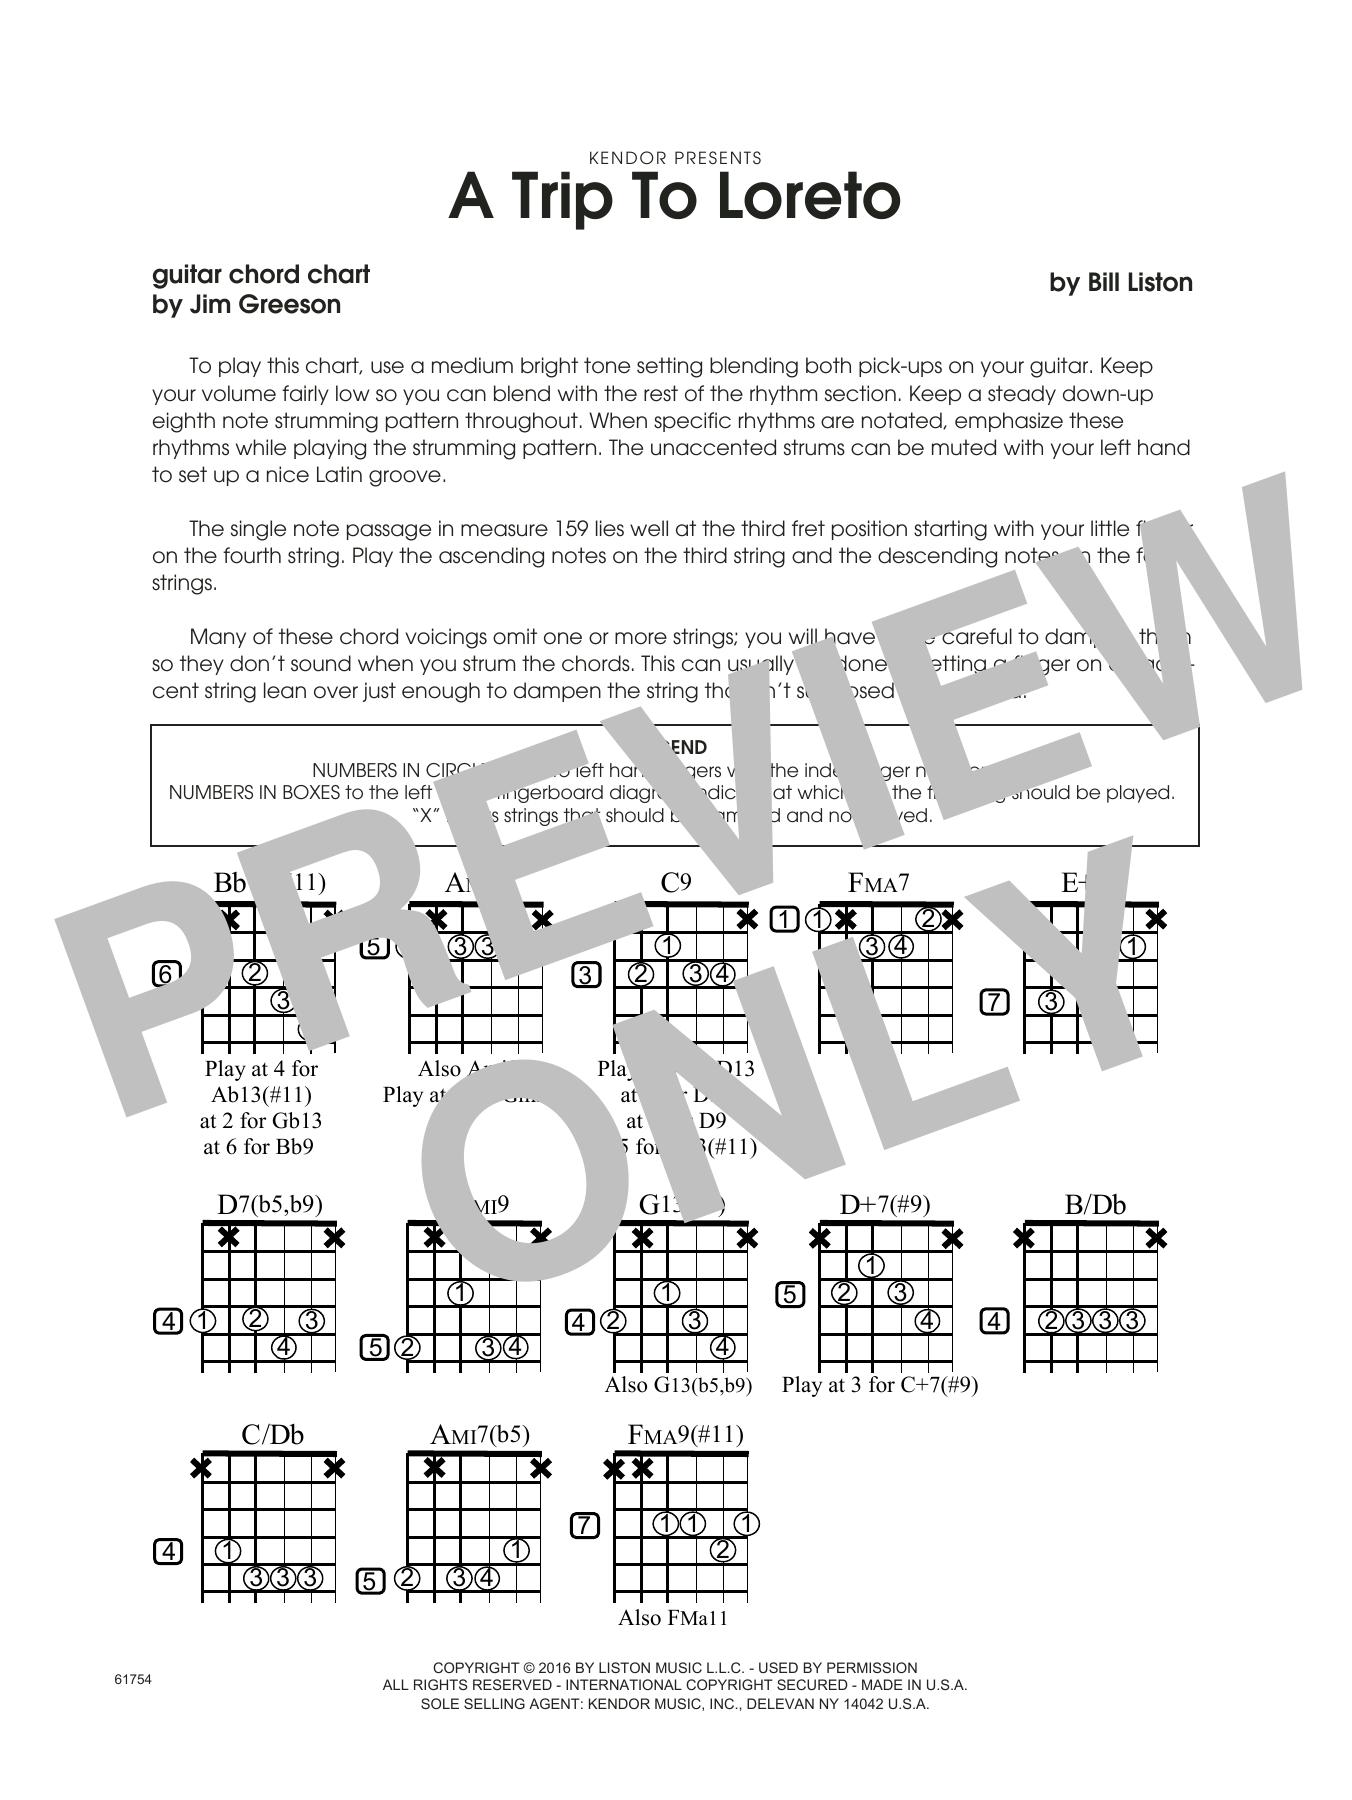 A Trip To Loreto - Guitar Chord Chart Sheet Music